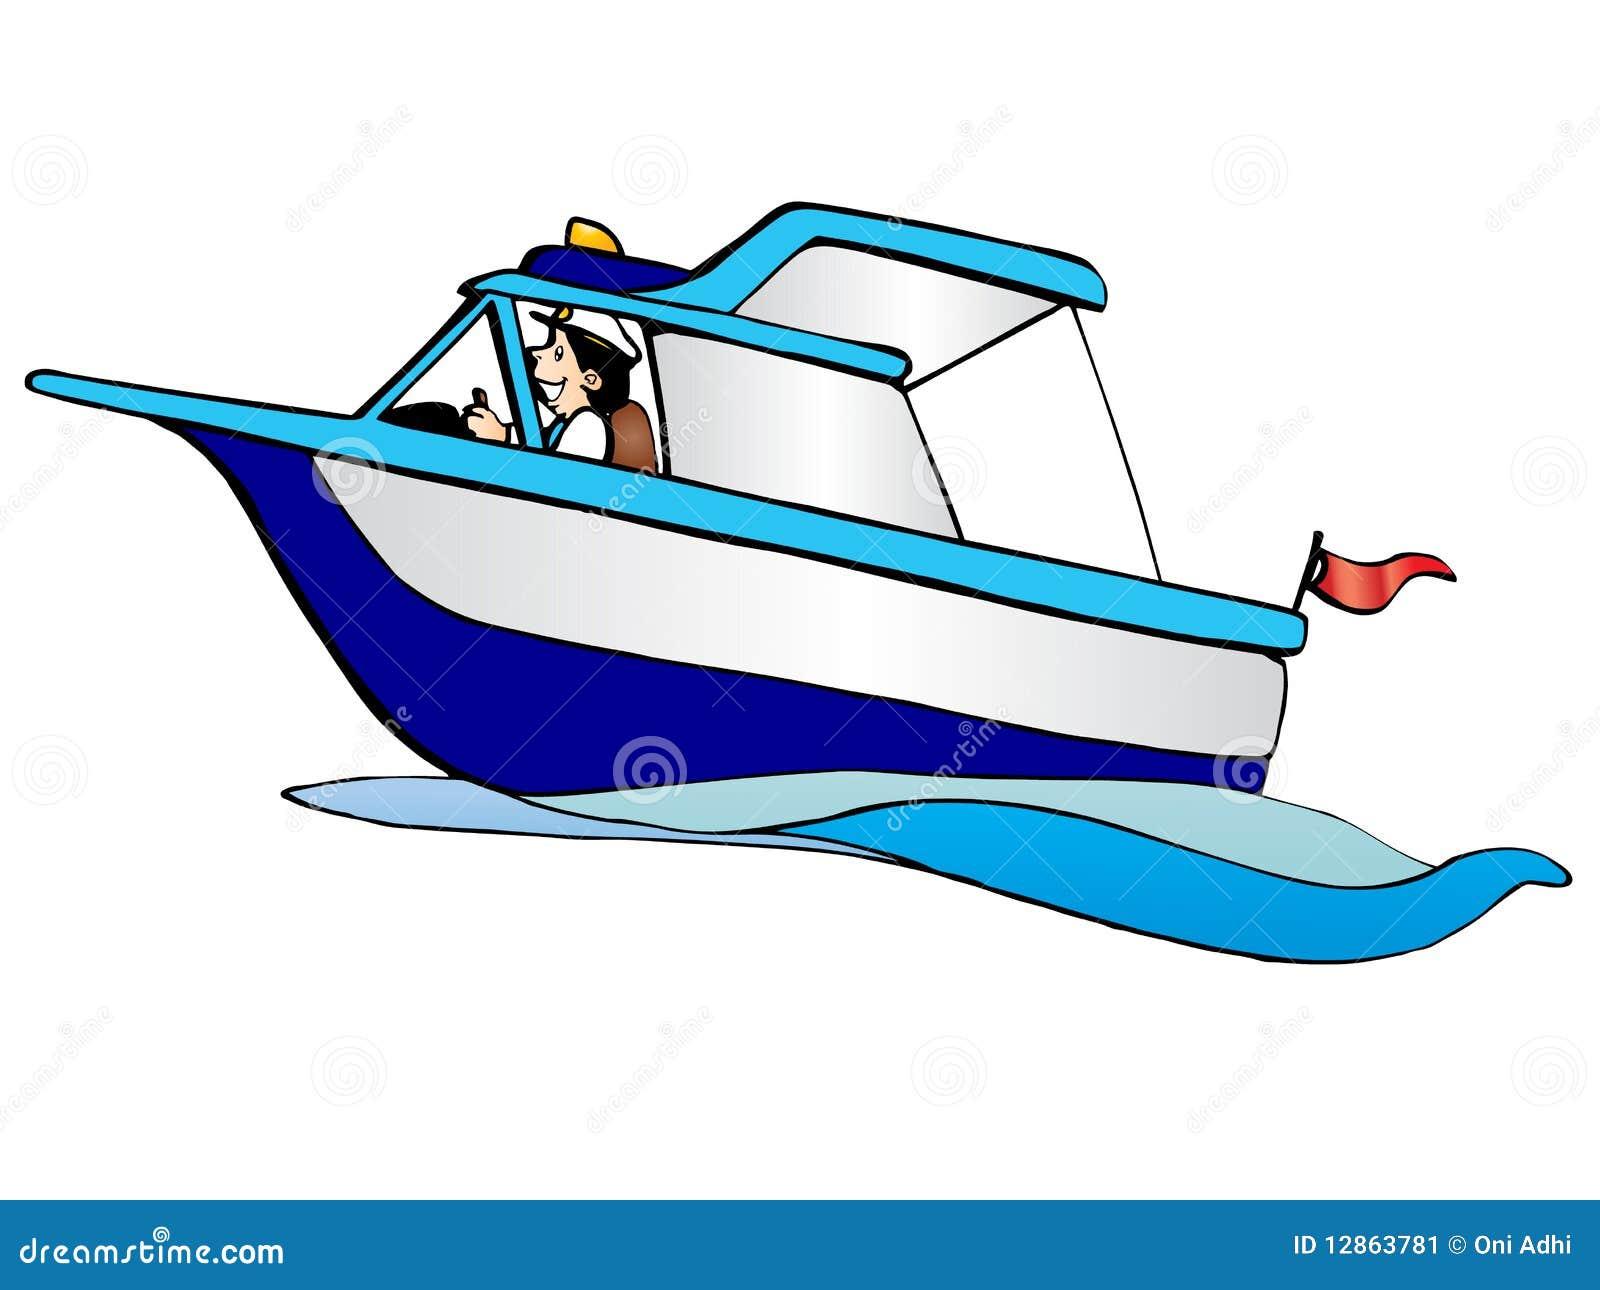 Cartoon Sea Boat Stock Image - Image: 12863781